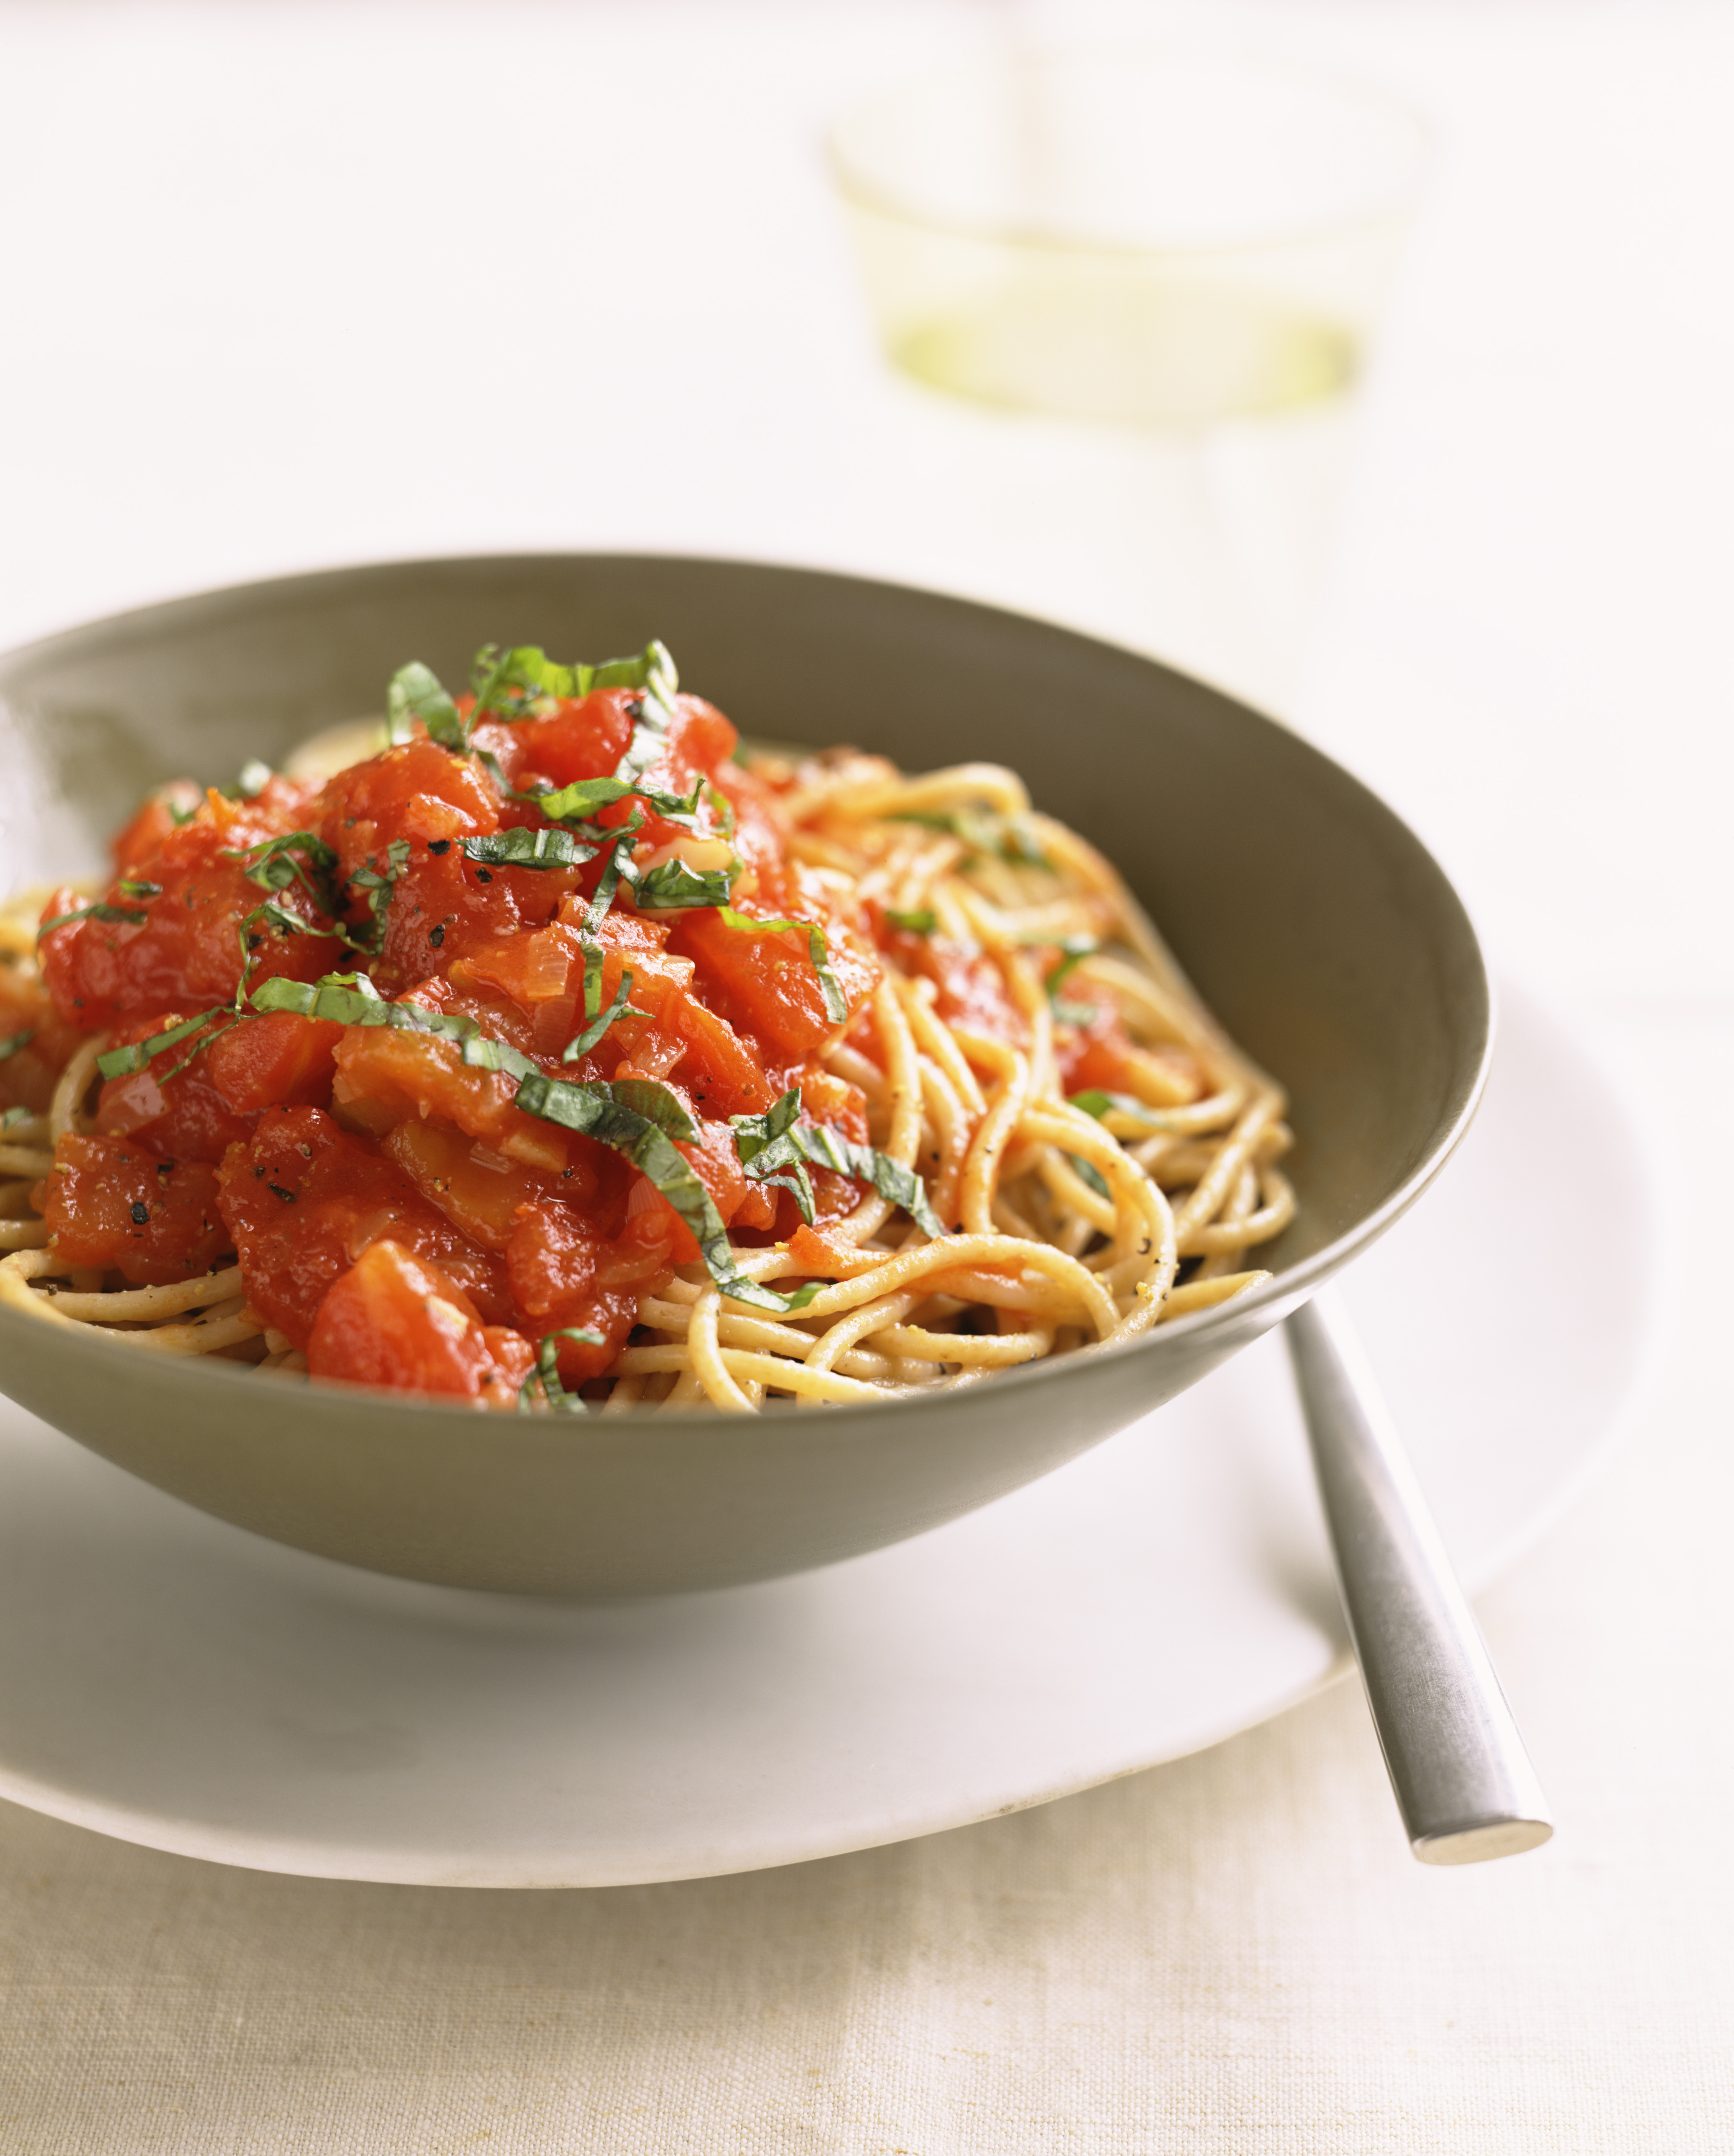 What foods cause nightmares? Pasta